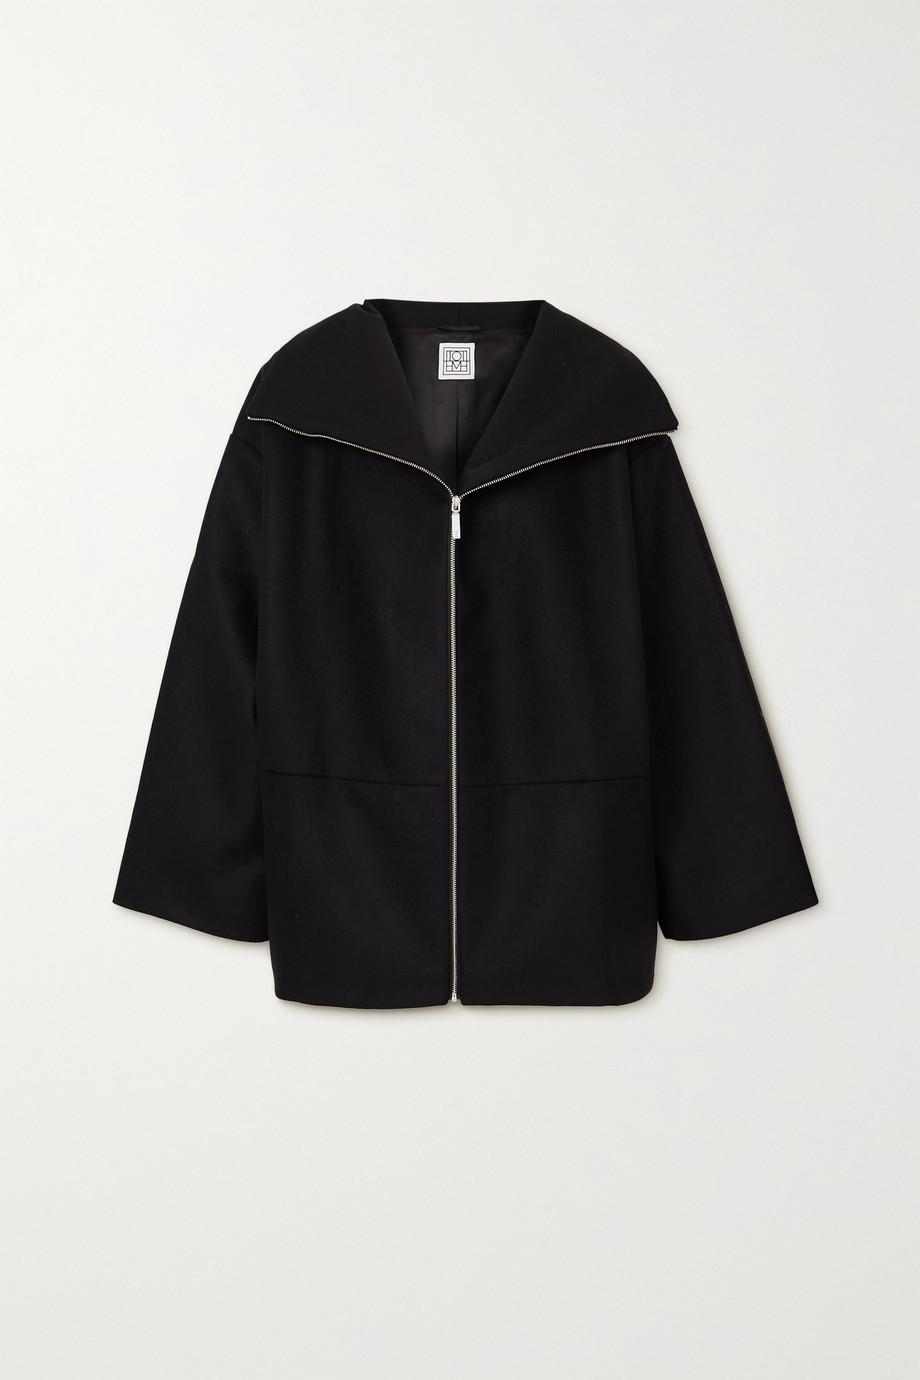 Totême Menfi wool-blend coat